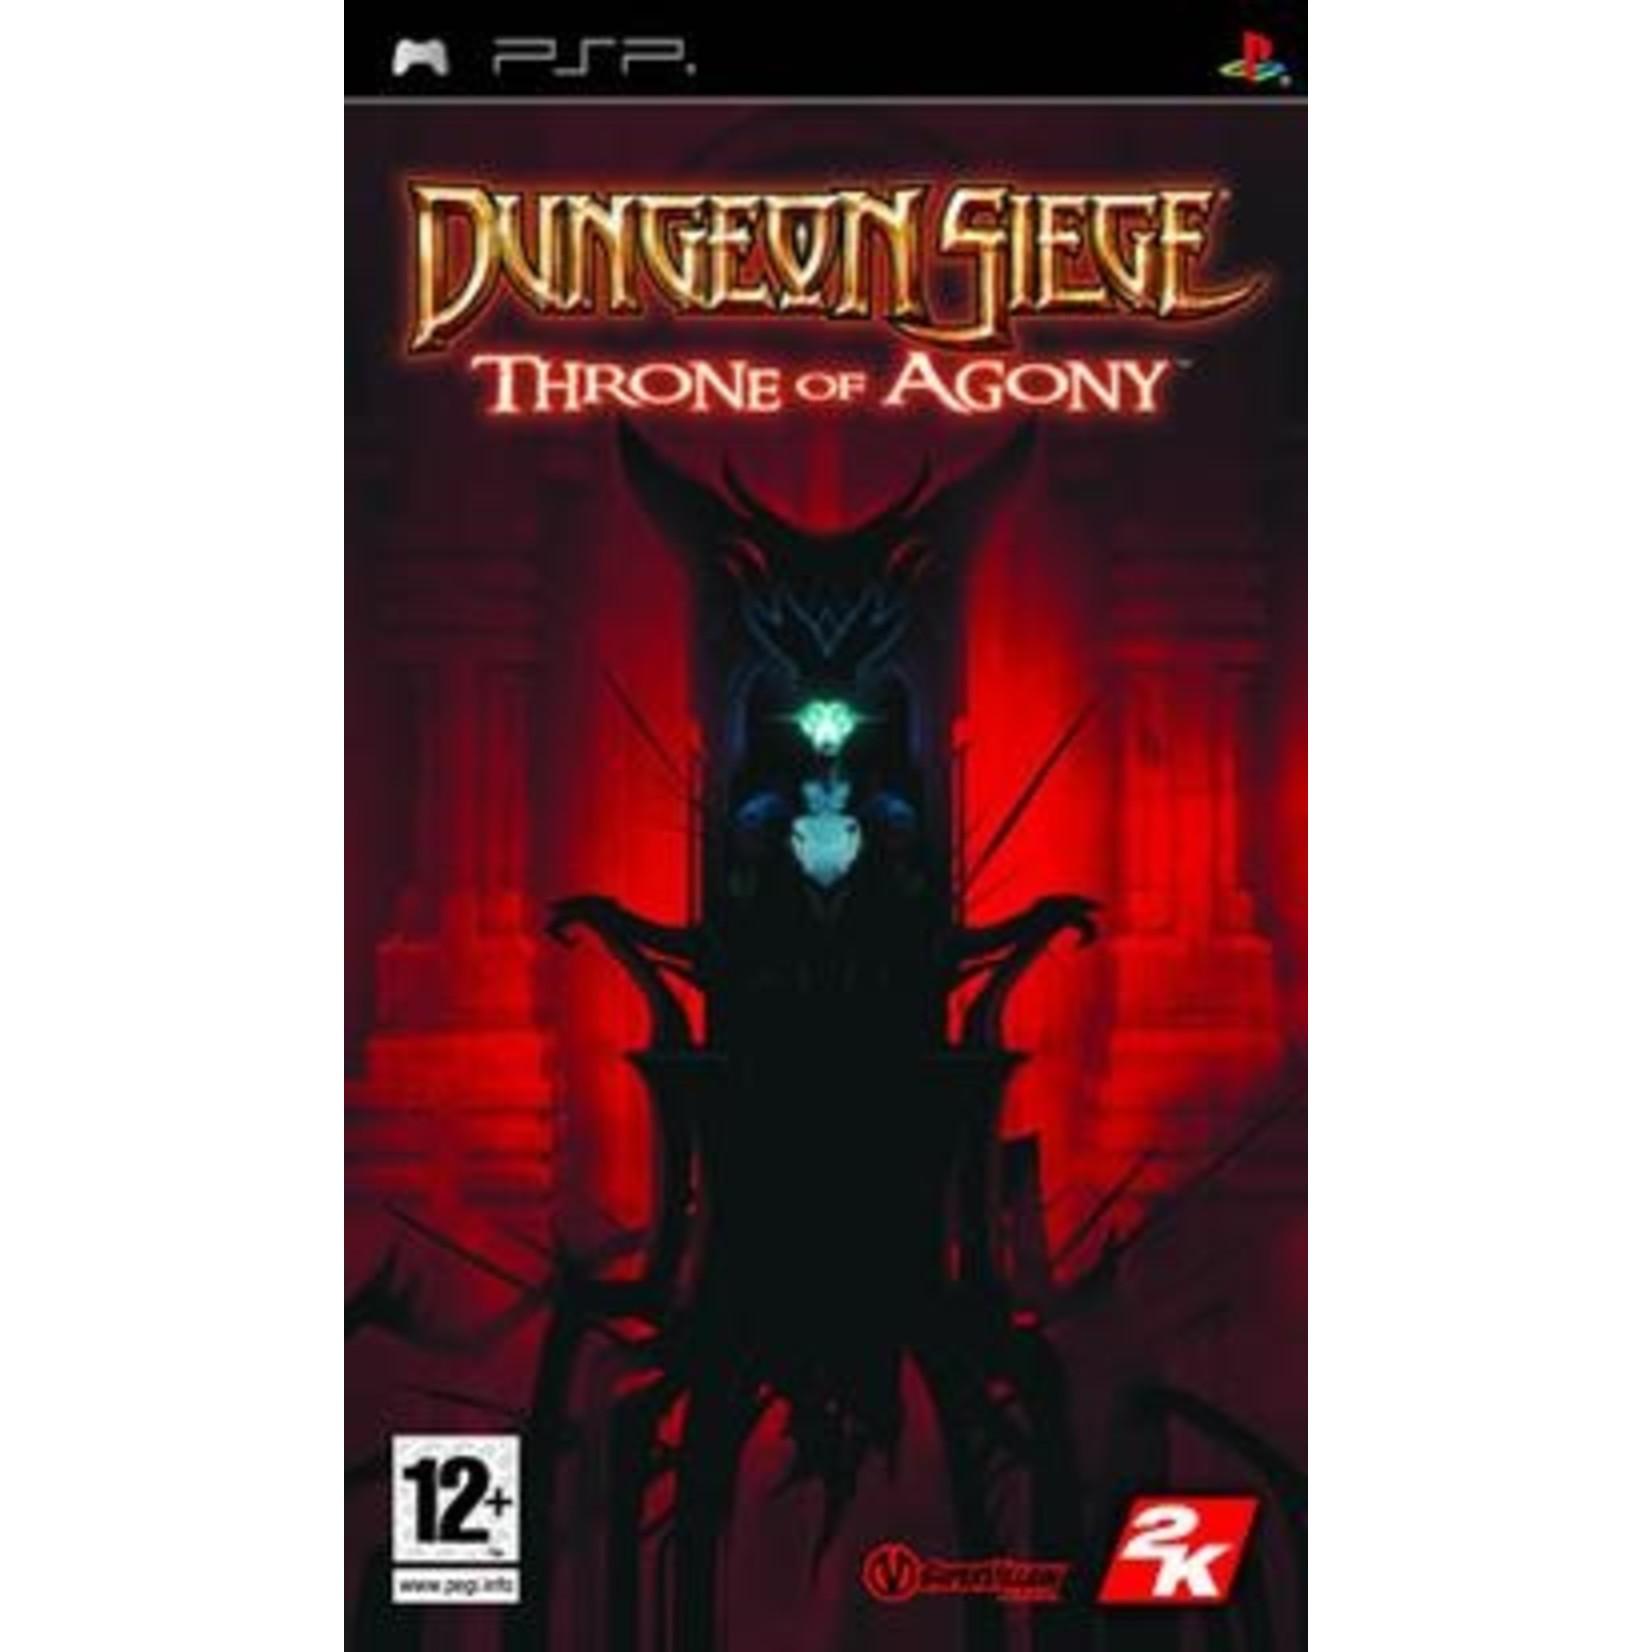 PSPU-Dungeon Siege Throne of Agony